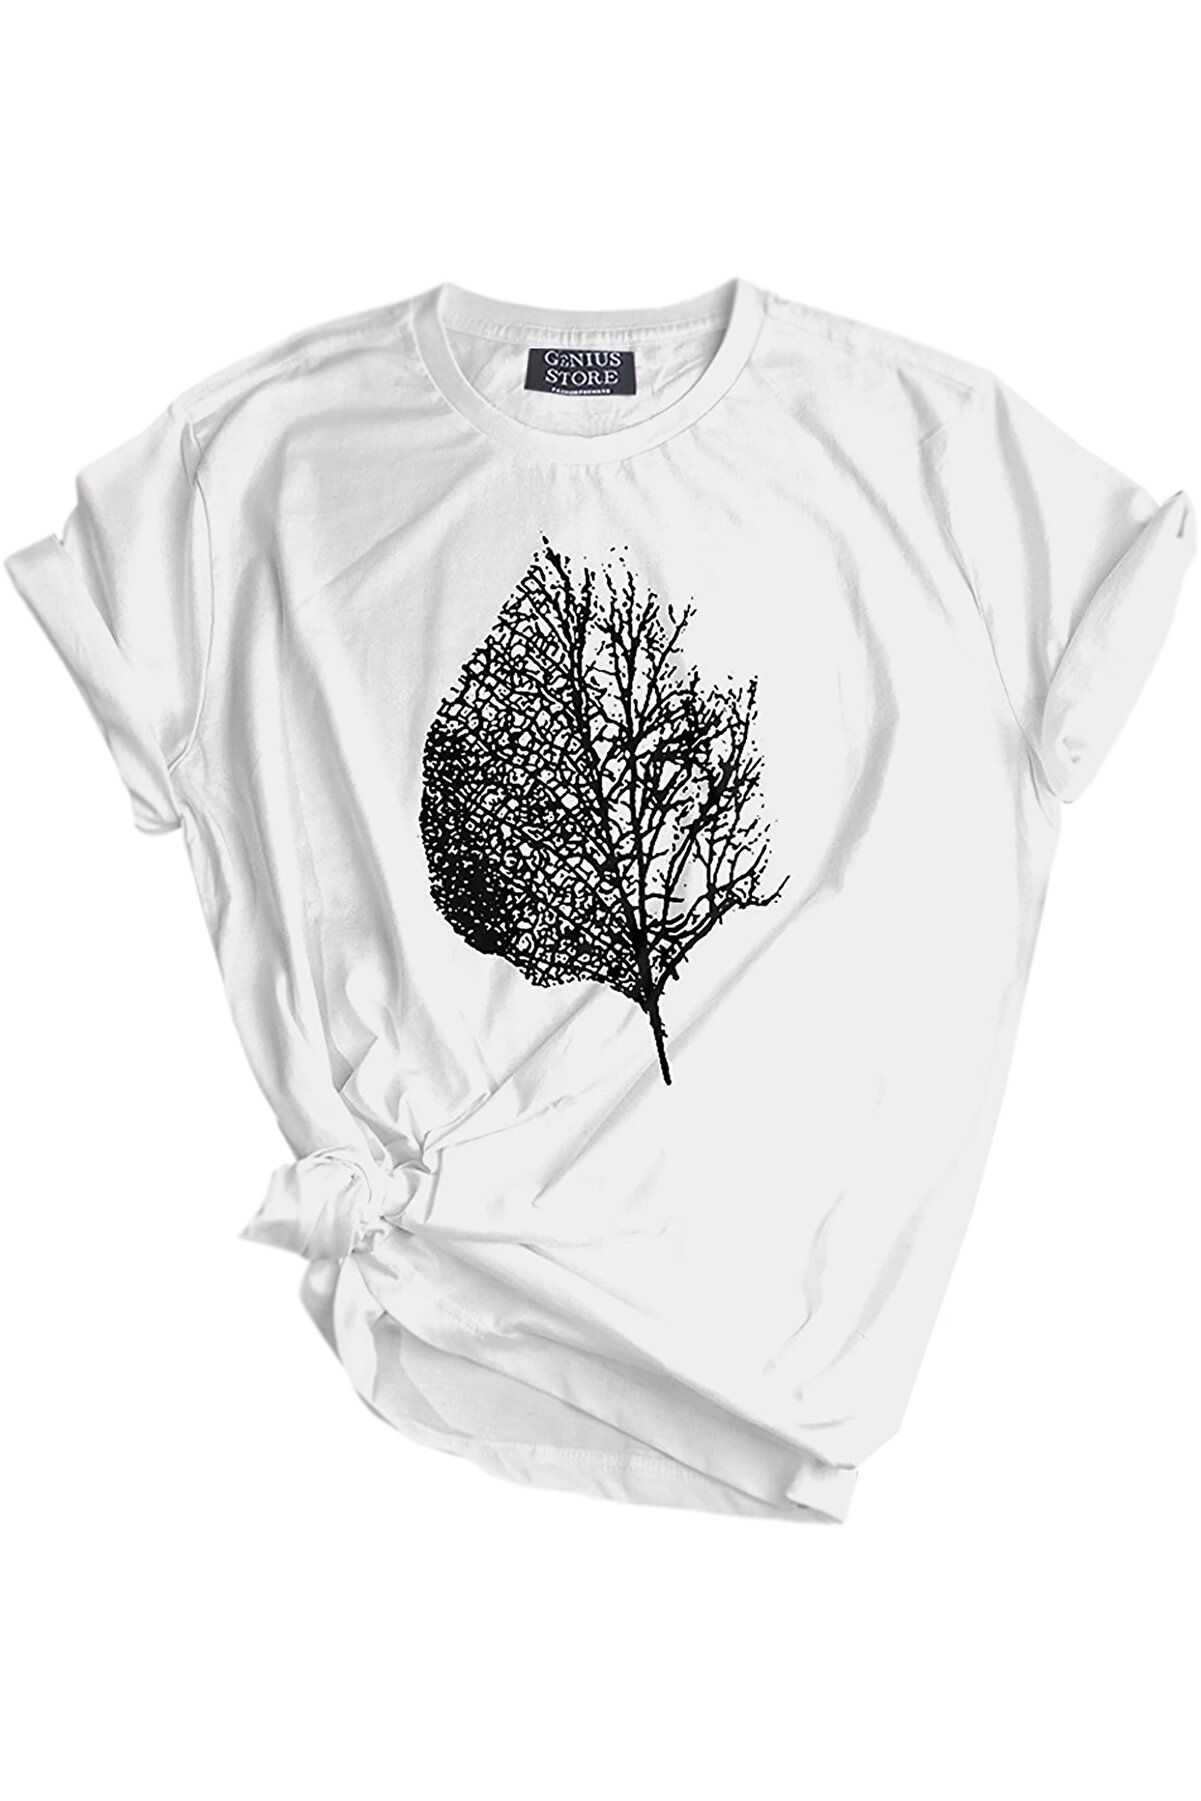 GENIUS Store Unisex Tişört Outdoor Baskılı T-shirt